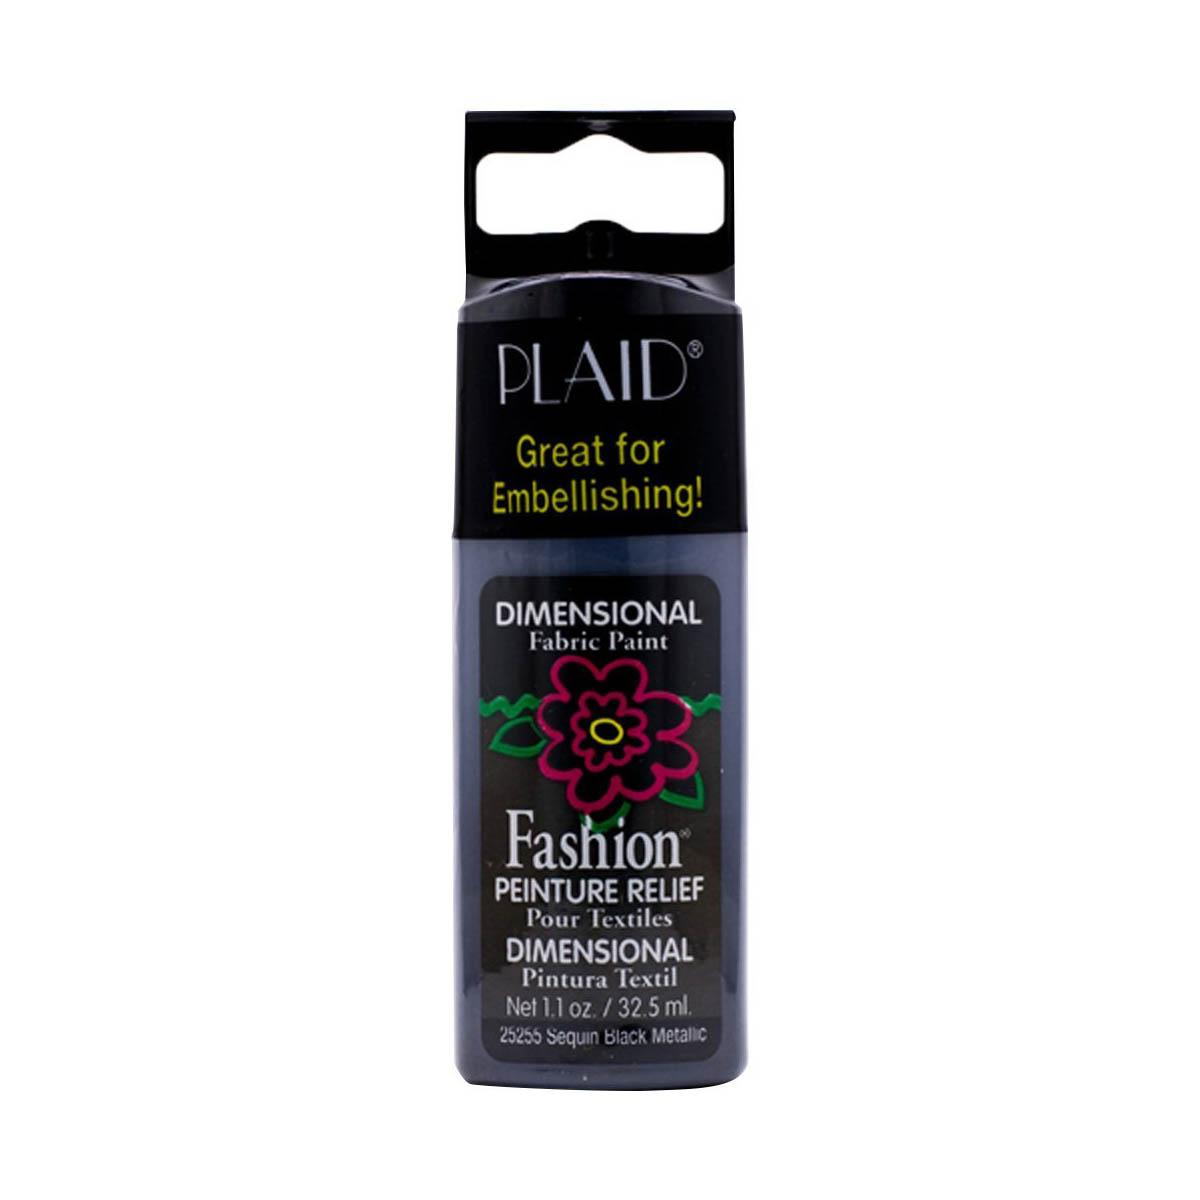 Fashion ® Dimensional Fabric Paint  - Metallic - Sequin Black